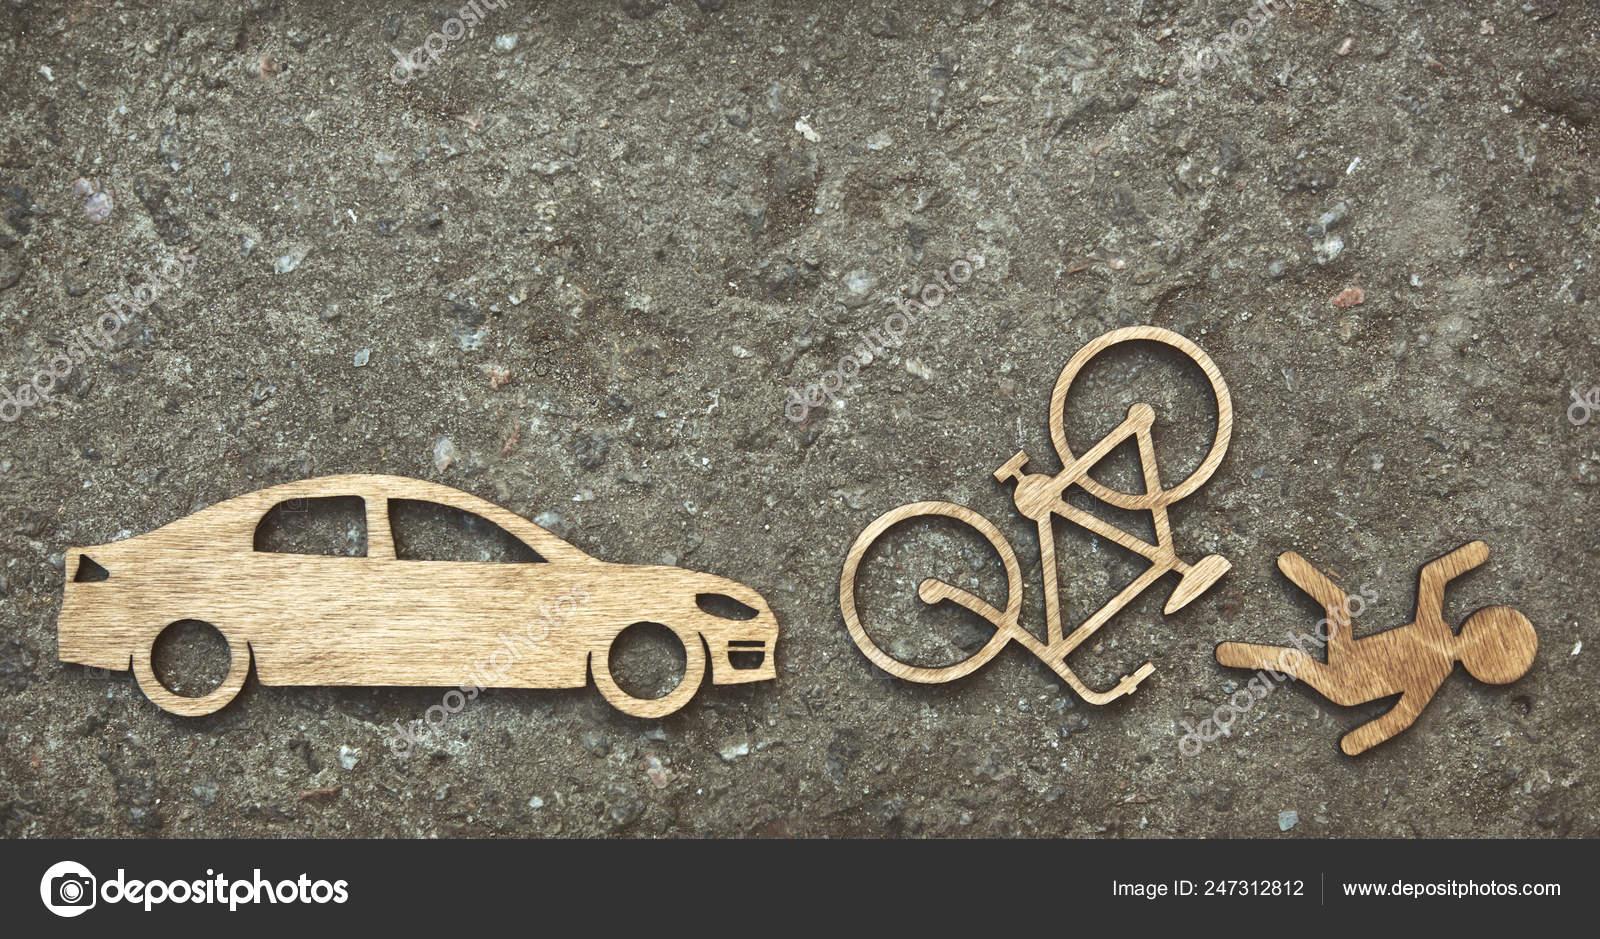 Coche Fondo Bicicleta Madera Piedra Juguete Sobre Poco Hombre UzpqSMV